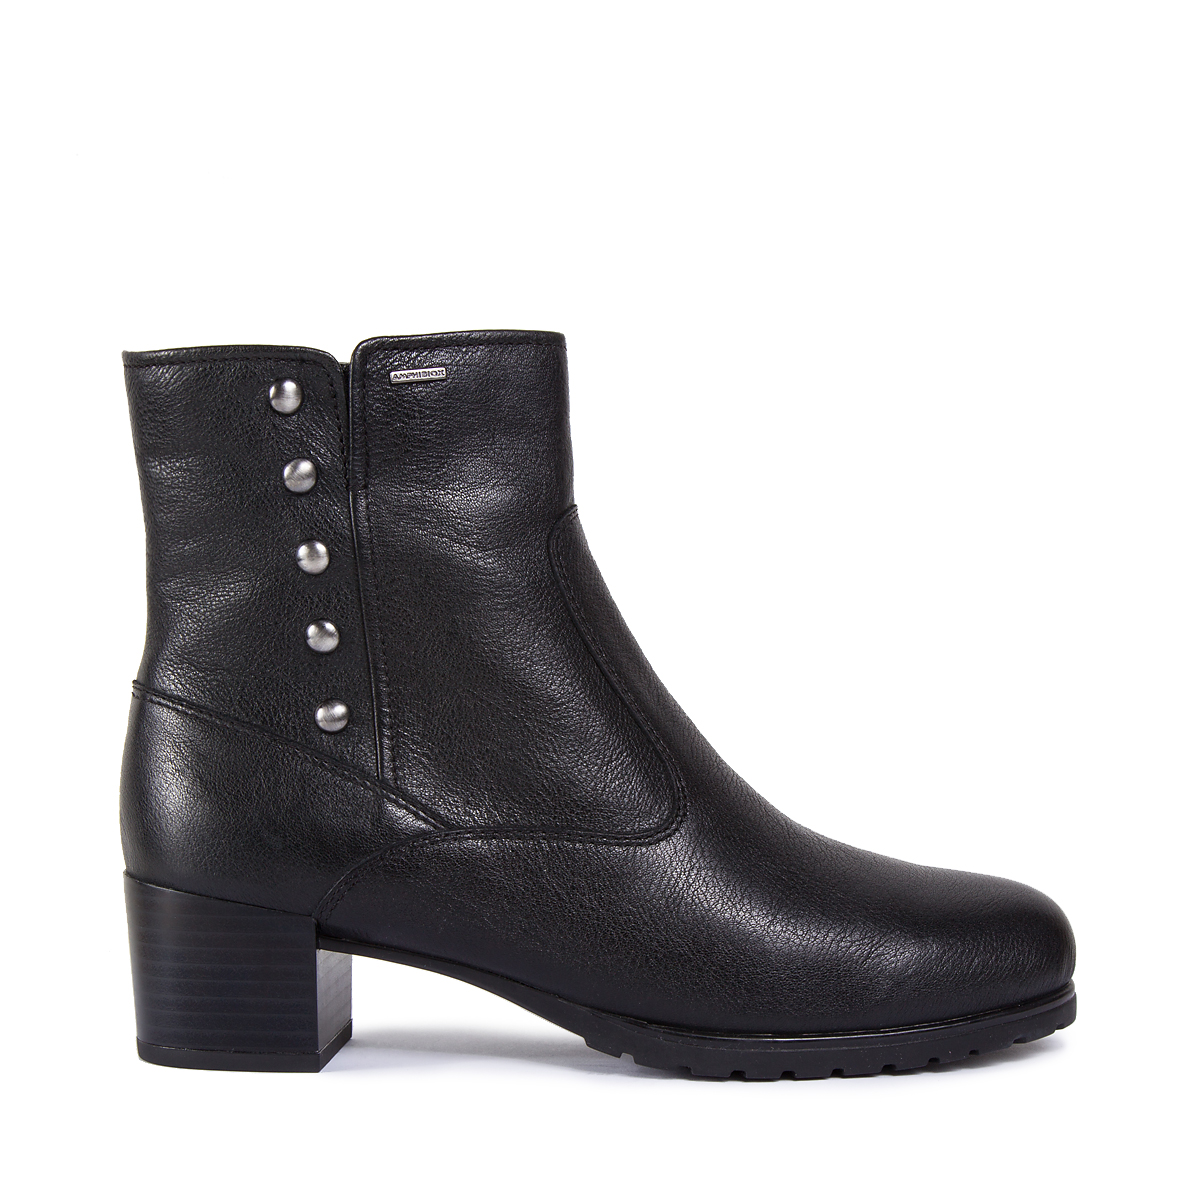 3dbe5ef39e Ετικέτα  γυναικεια παπούτσια